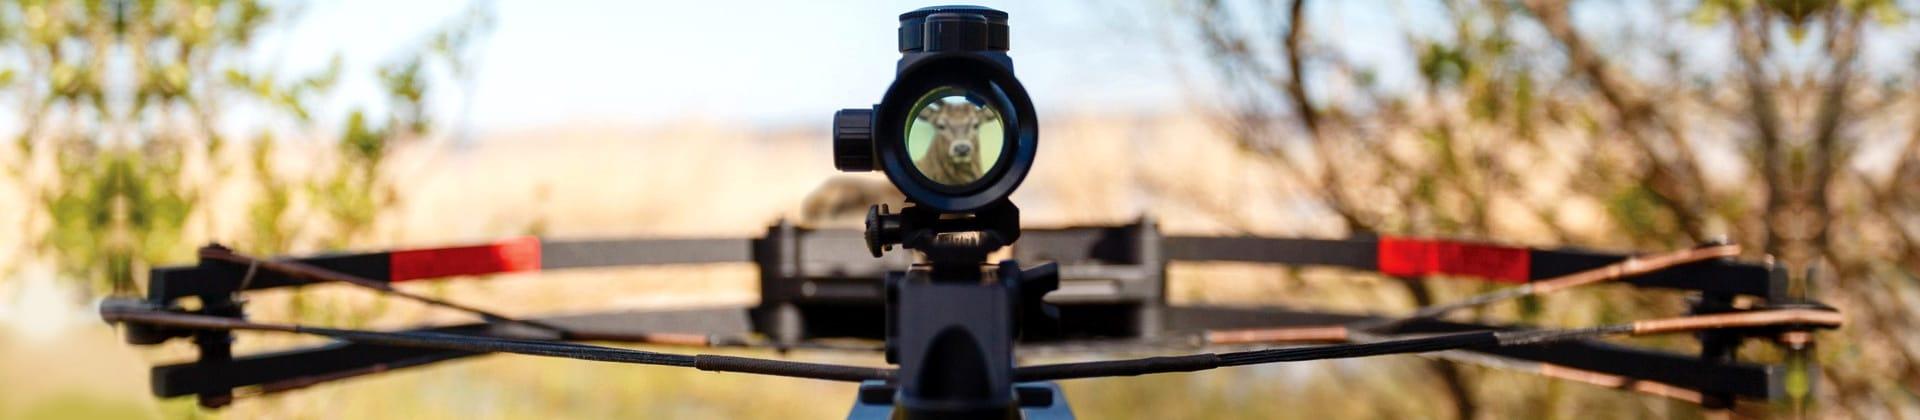 Best Crossbows for Deer Hunting Reviewed in Detail